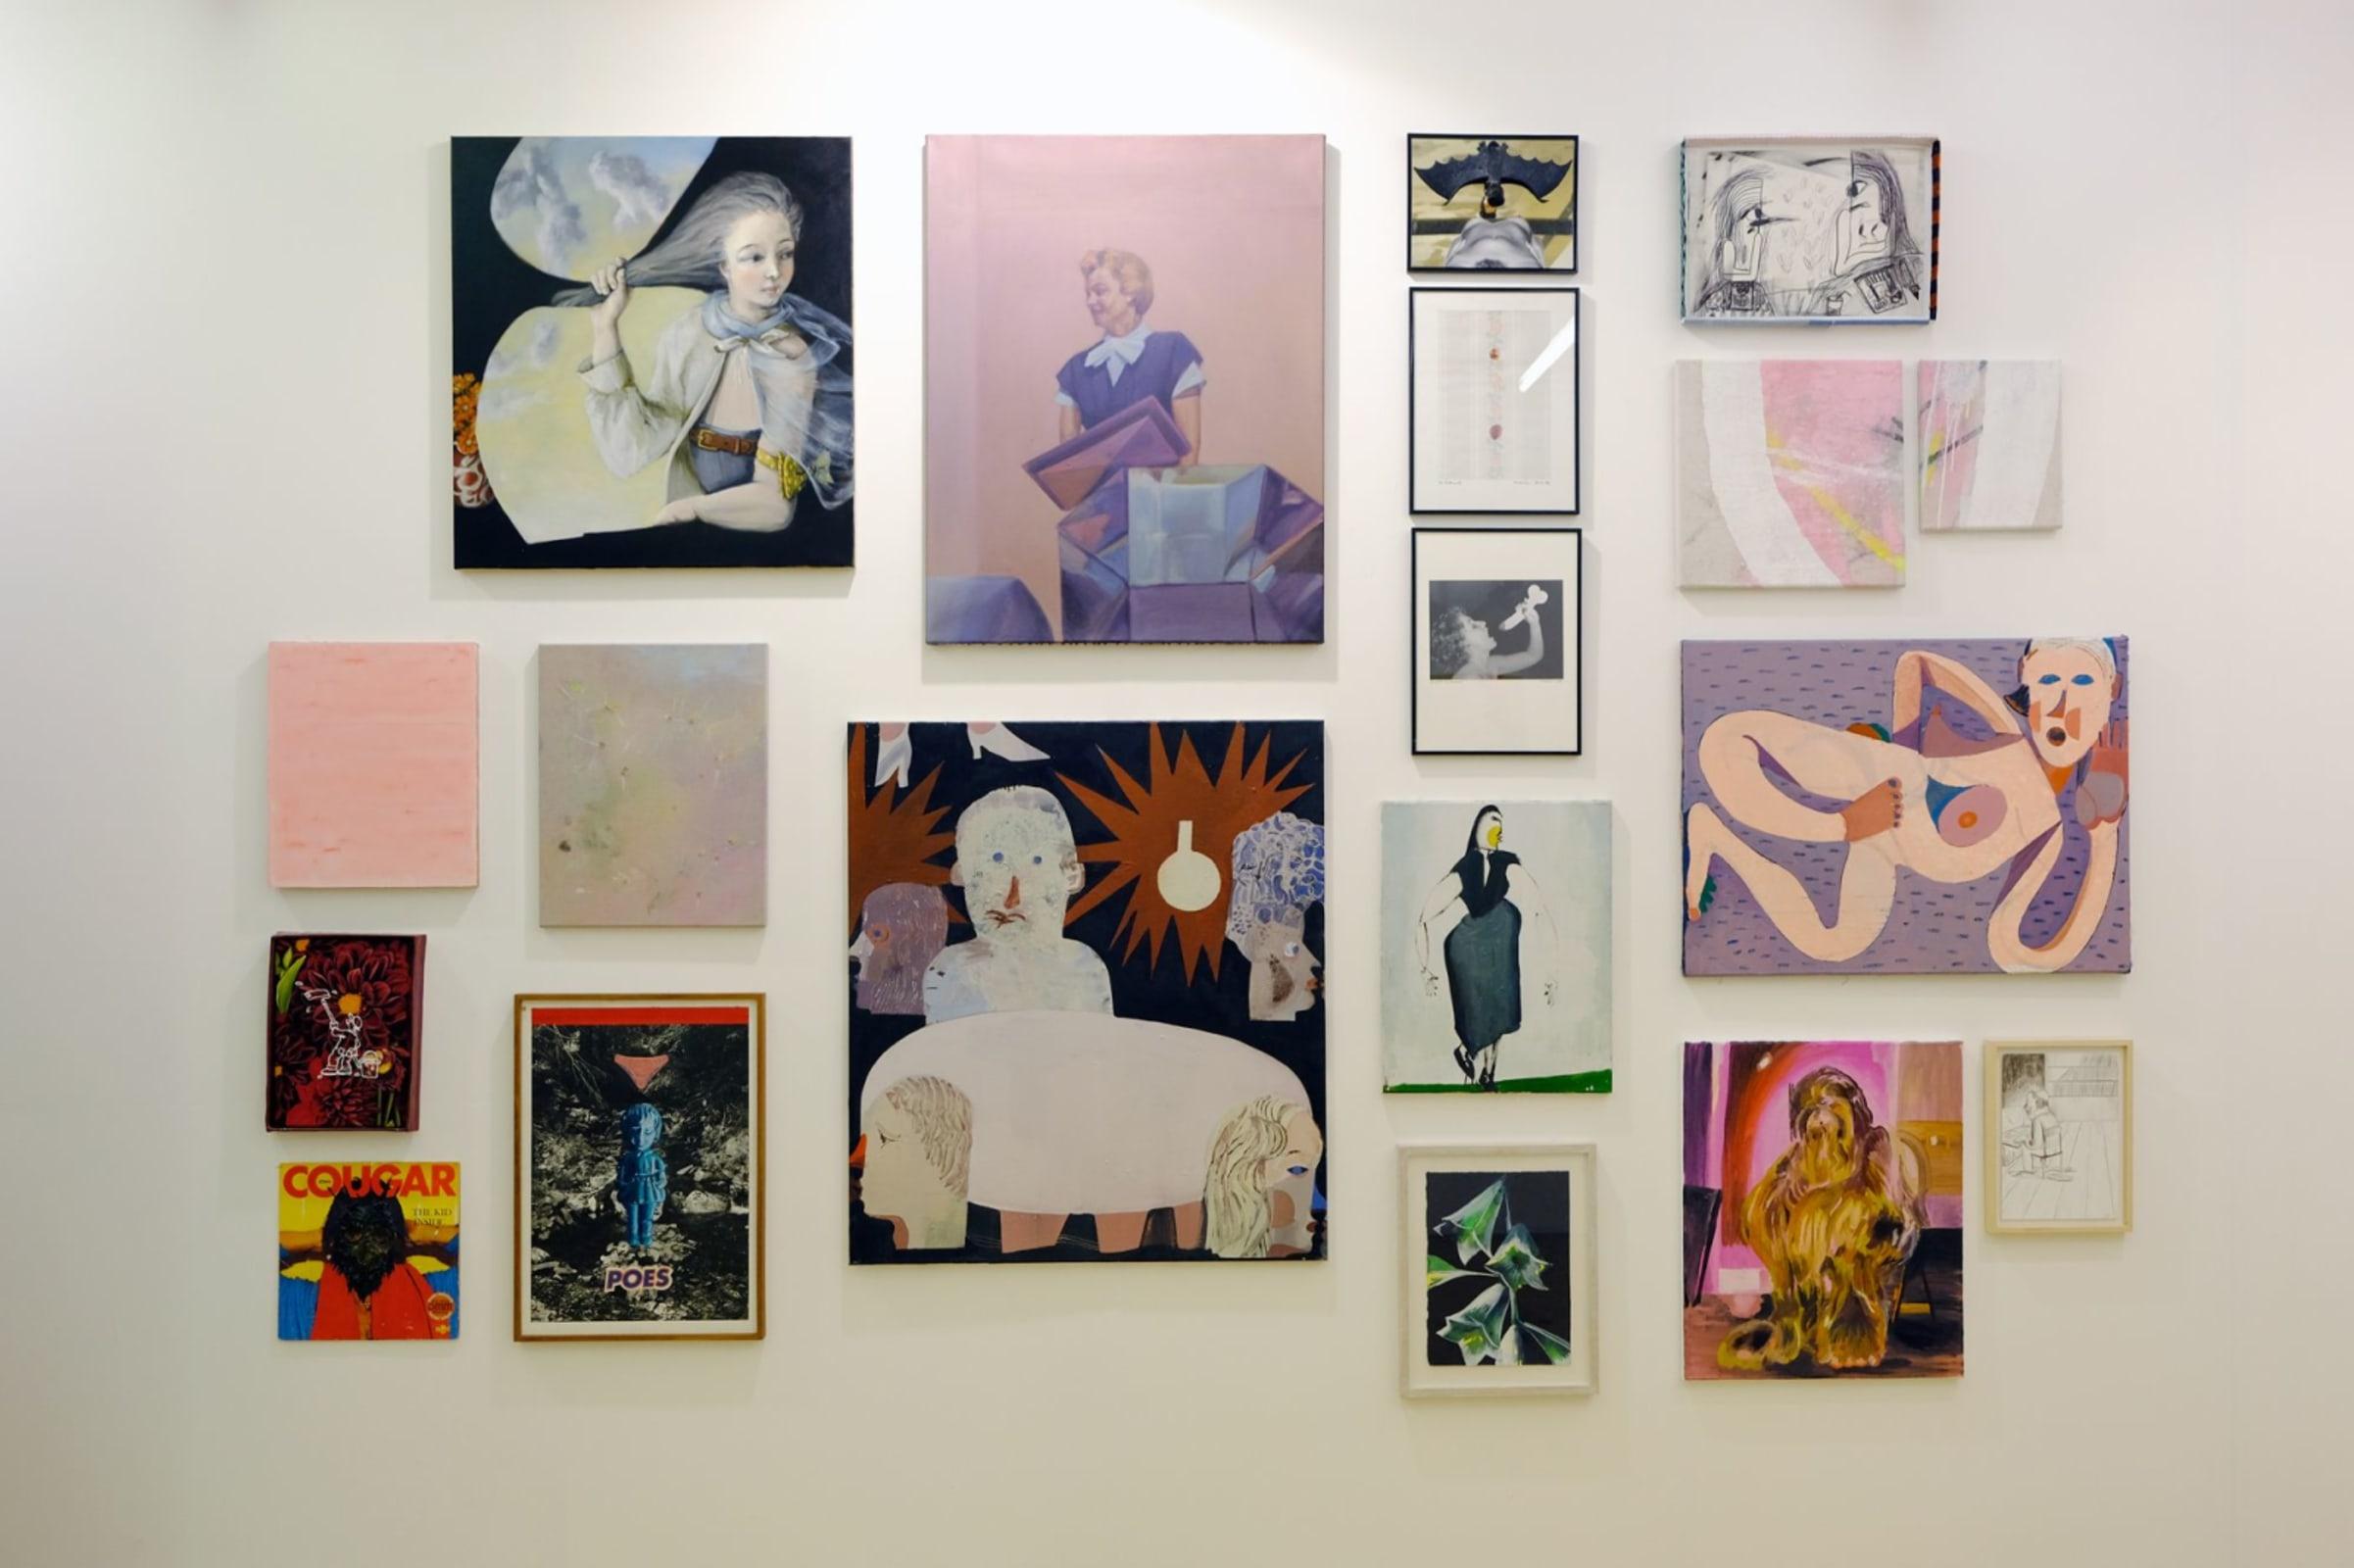 Art Rotterdam 2019, Pieter Jennes, Bendt Eyckermans, Gommaar Gilliams, Catharina Dhaen, Charline Tyberghein,